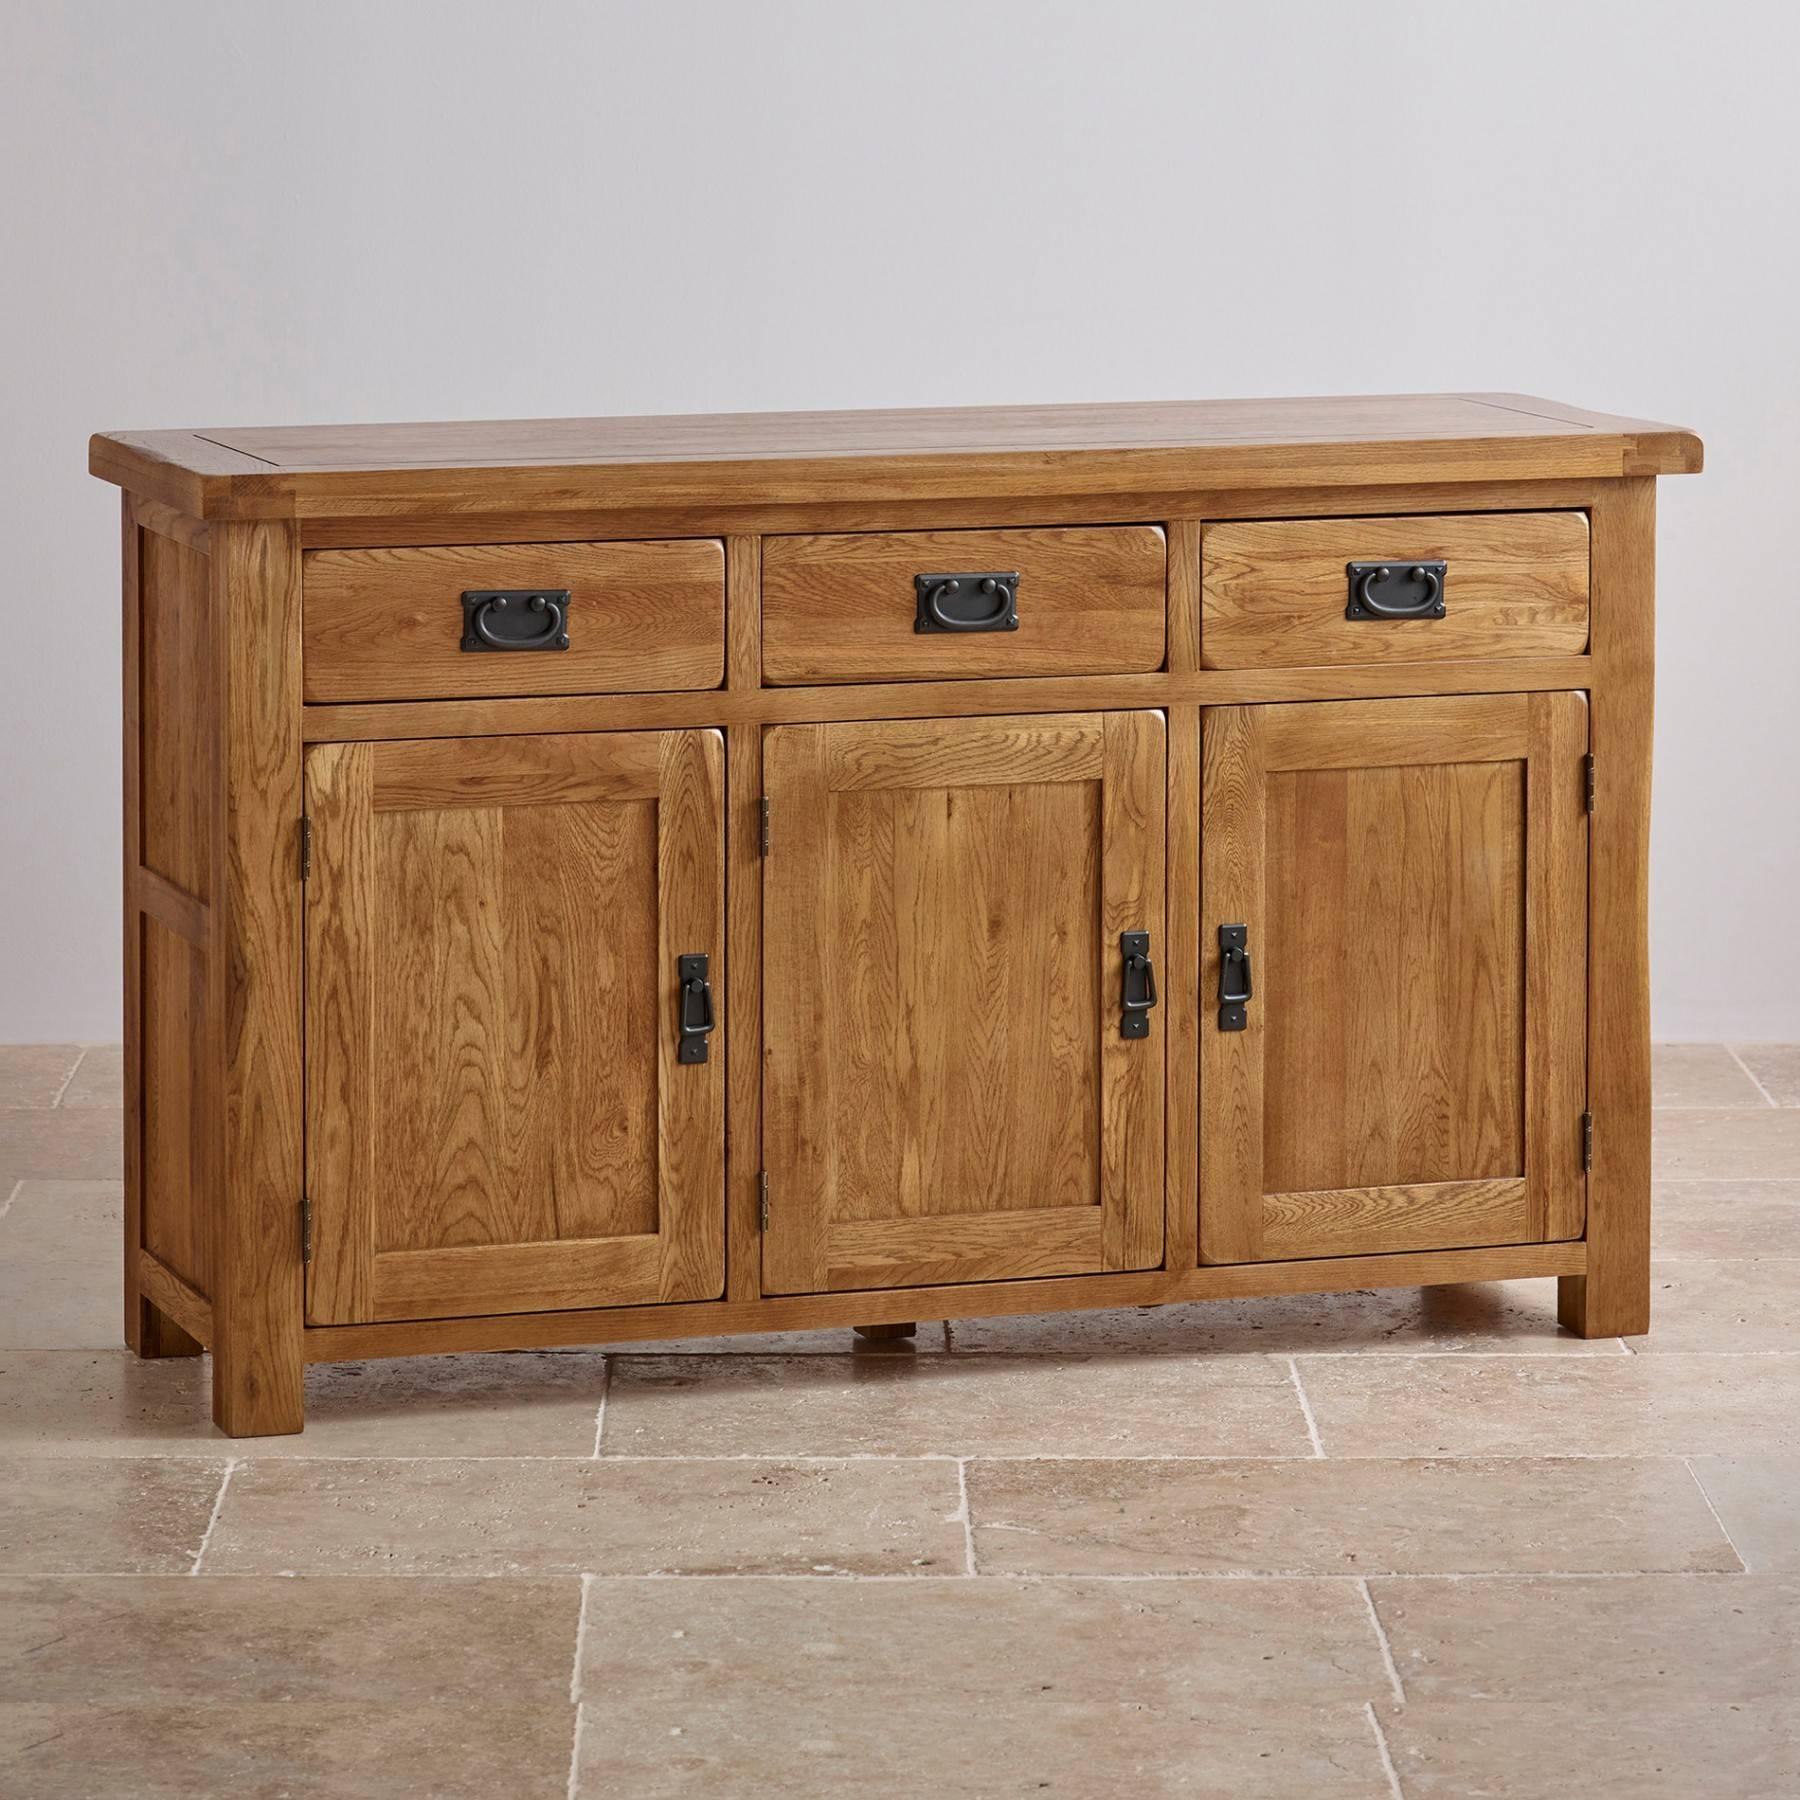 Original Rustic Solid Oak Large Sideboard | Sideboards | Dining Inside Recent Rustic Oak Large Sideboards (#12 of 15)